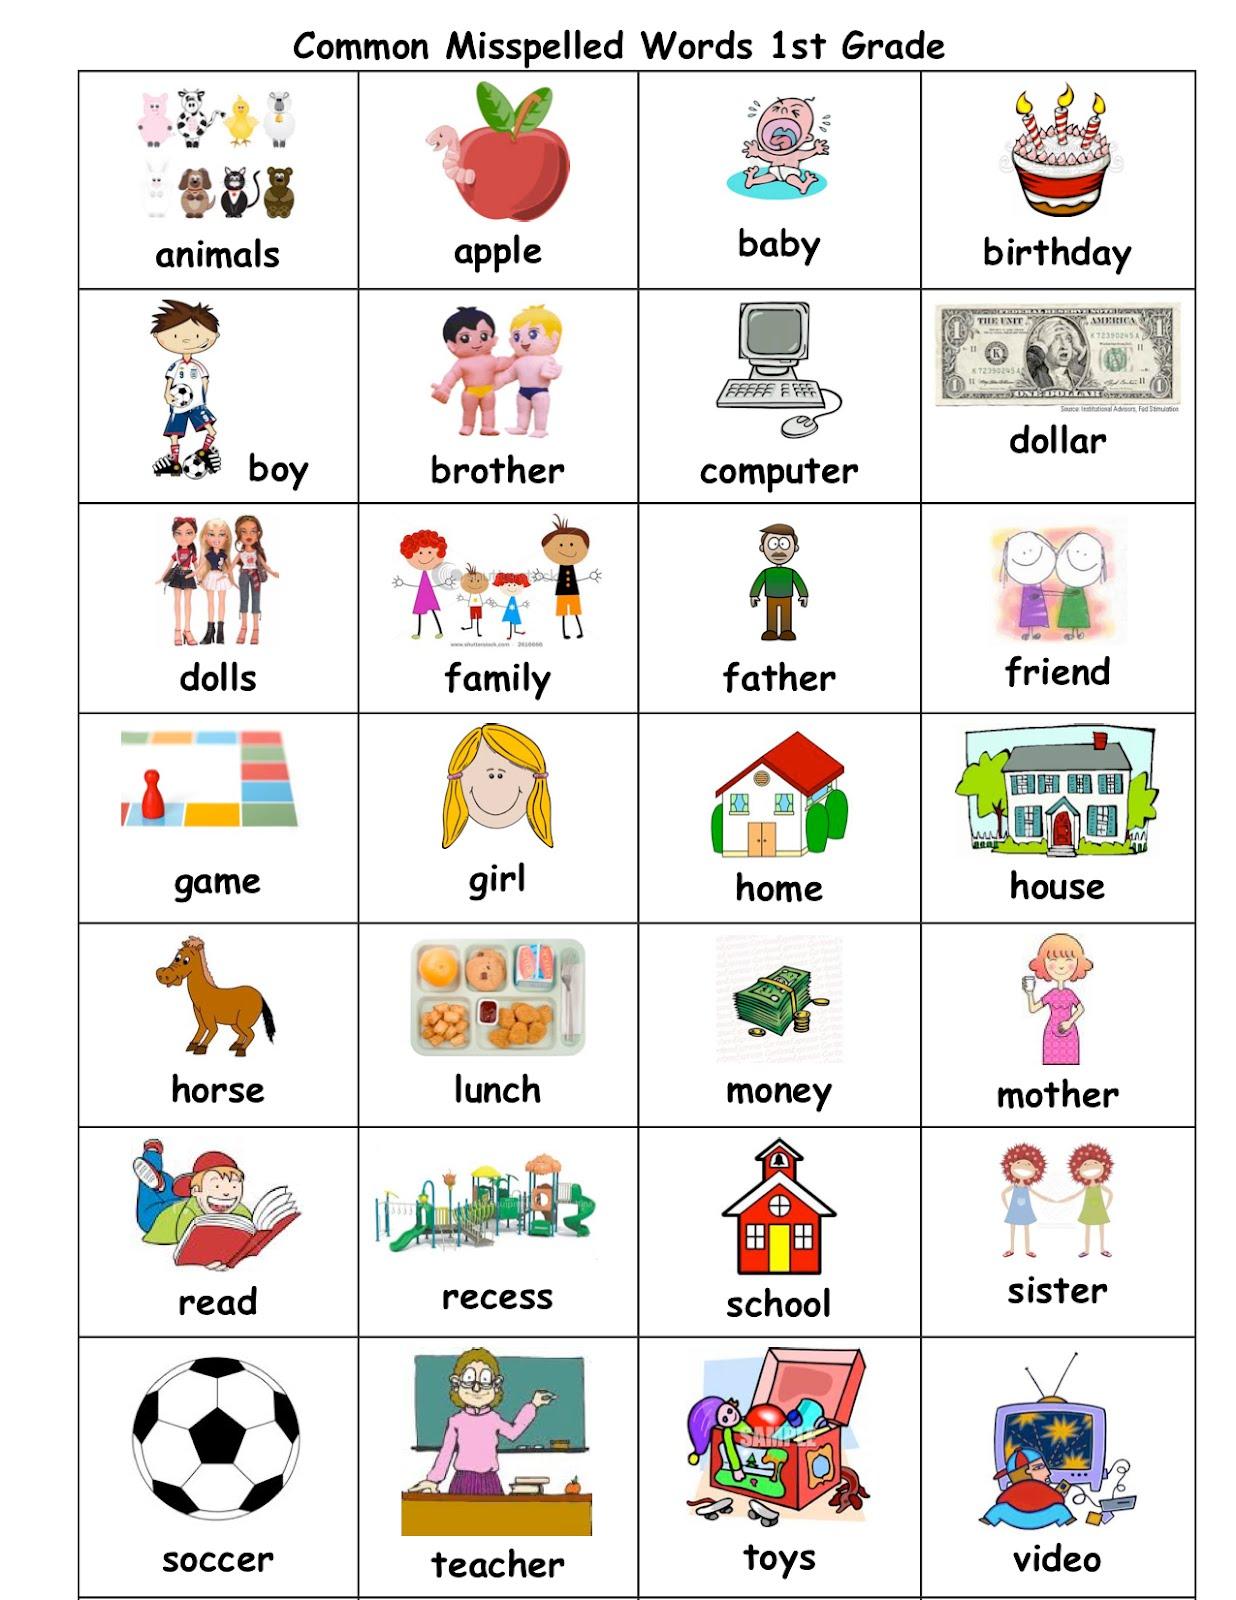 http://2.bp.blogspot.com/-RcIa4pfYiTc/TxxAkeYmoSI/AAAAAAAABMQ/uS4JLOnOnos/s1600/common_misspelled_words_dictionary.jpg